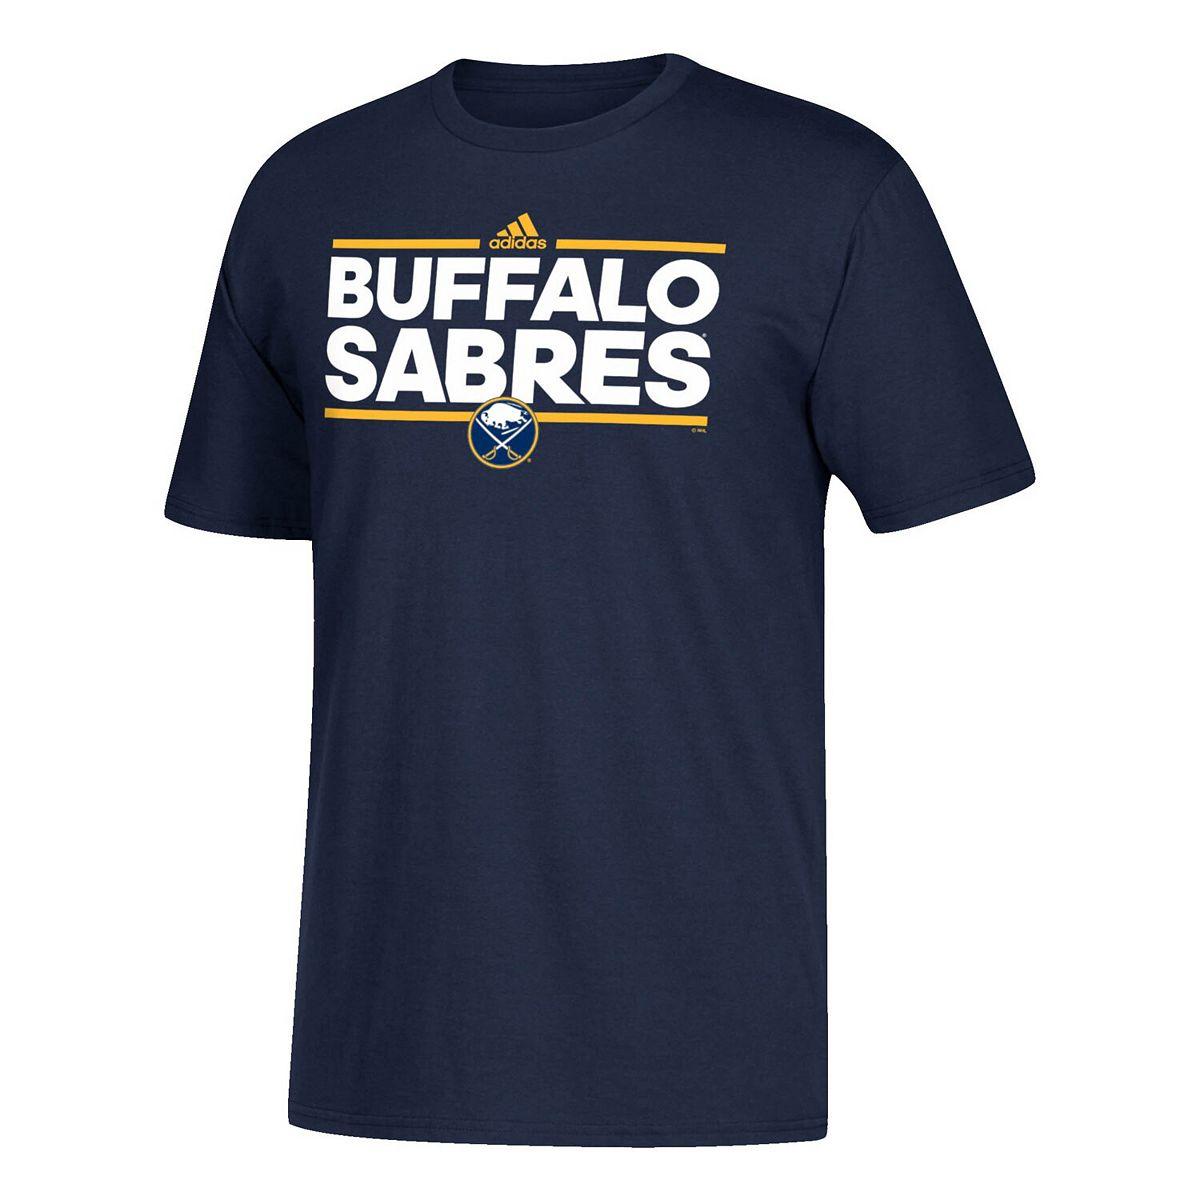 Men's adidas Navy Buffalo Sabres Big & Tall Dassler T-Shirt qtR6k